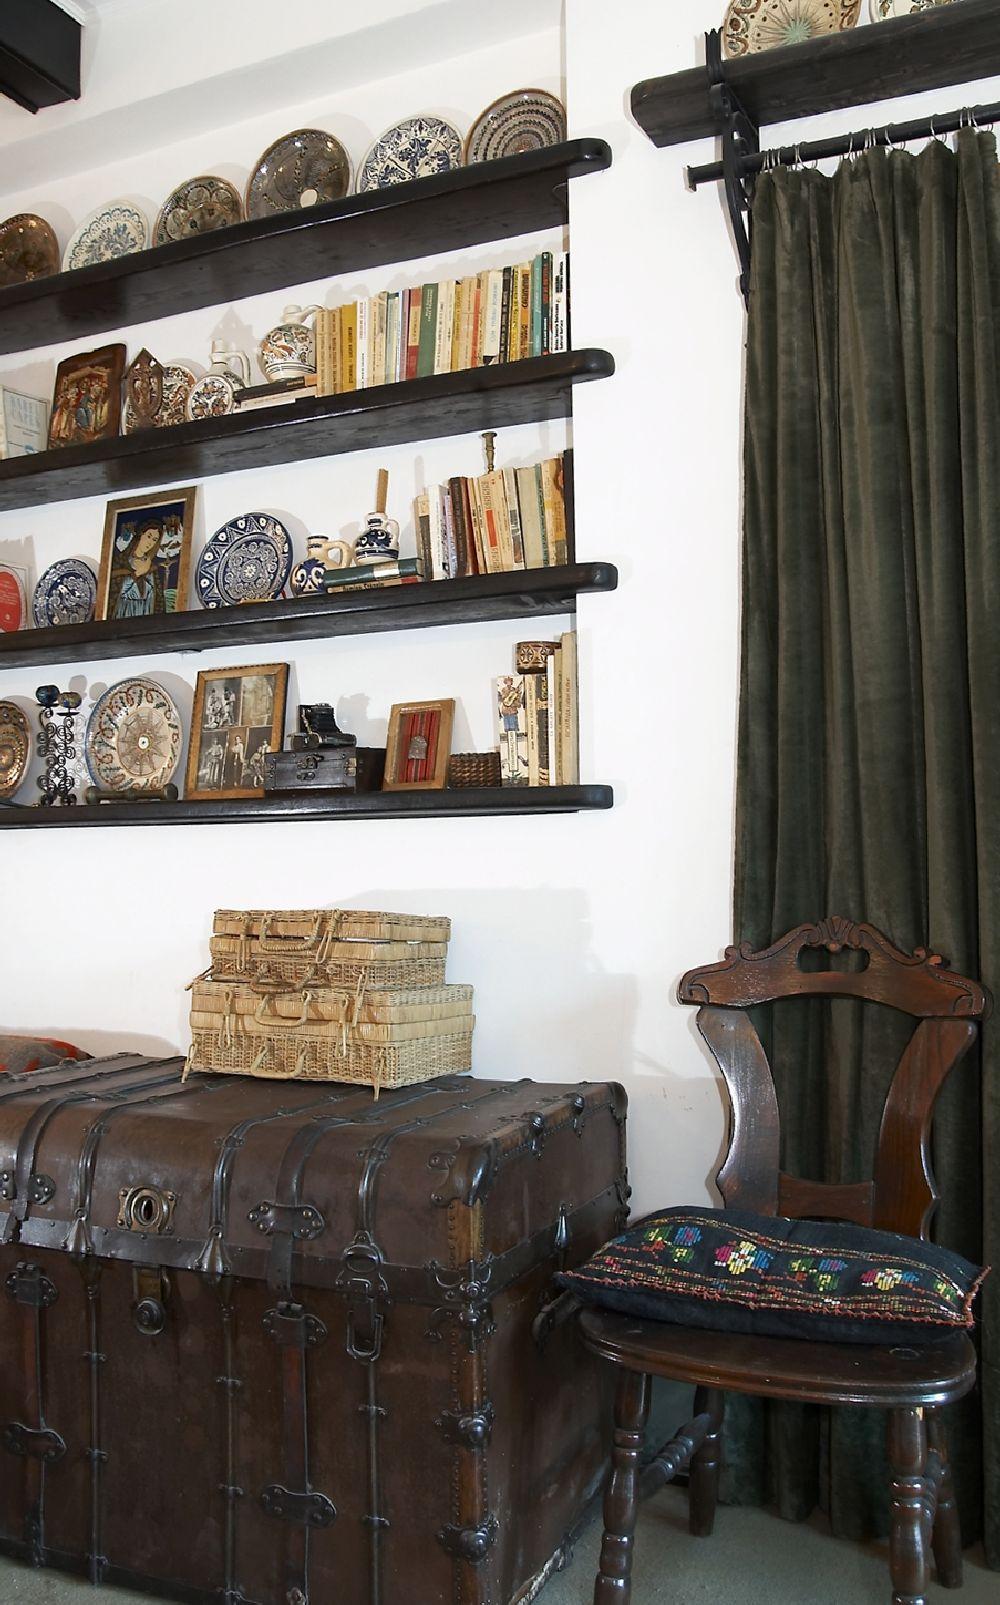 adelaparvu.com despre Anca Ciuciulin si casa ei cu decor traditional romanesc (16)